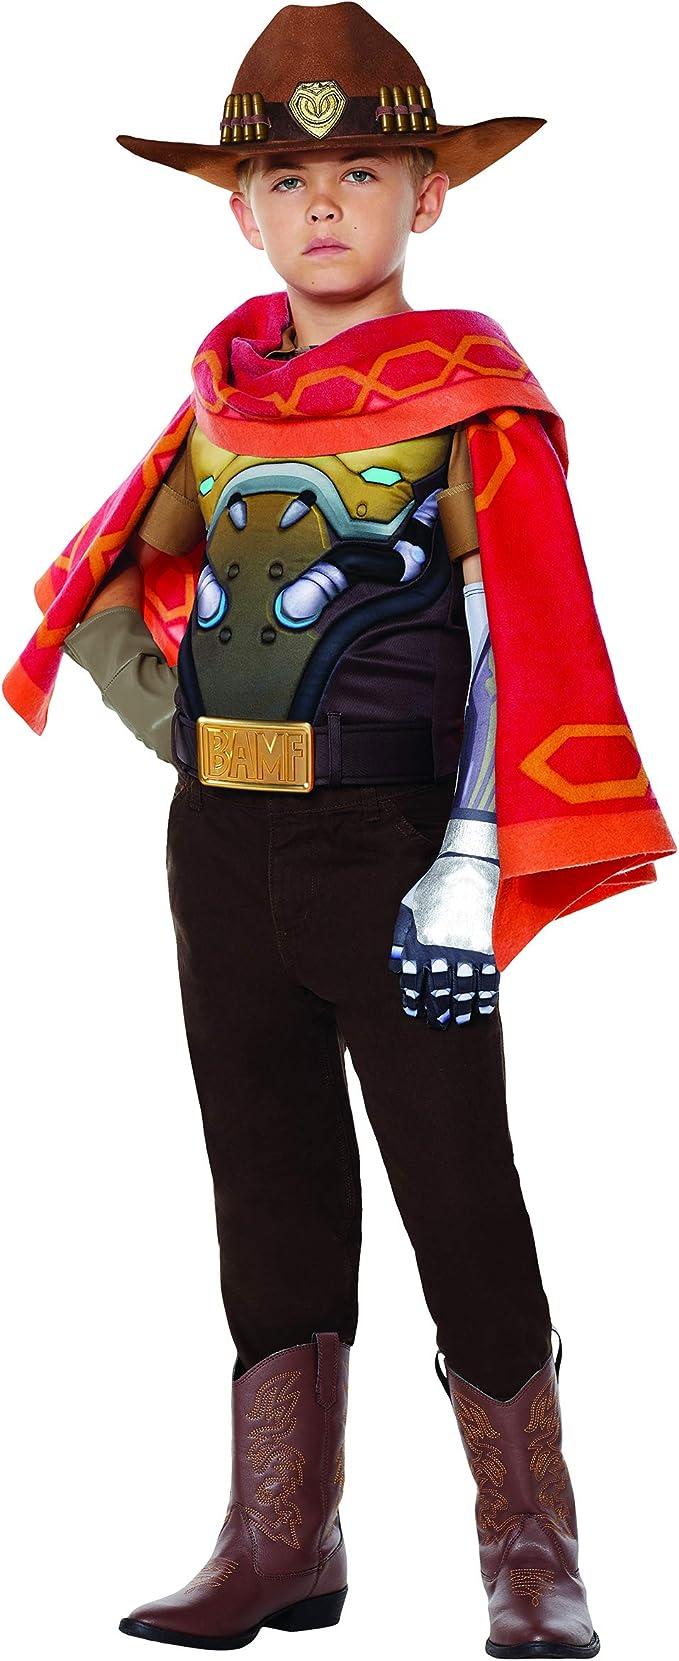 Mccree Halloween Costume 2020 Amazon.com: Kids McCree Overwatch Costume   Officially Licensed